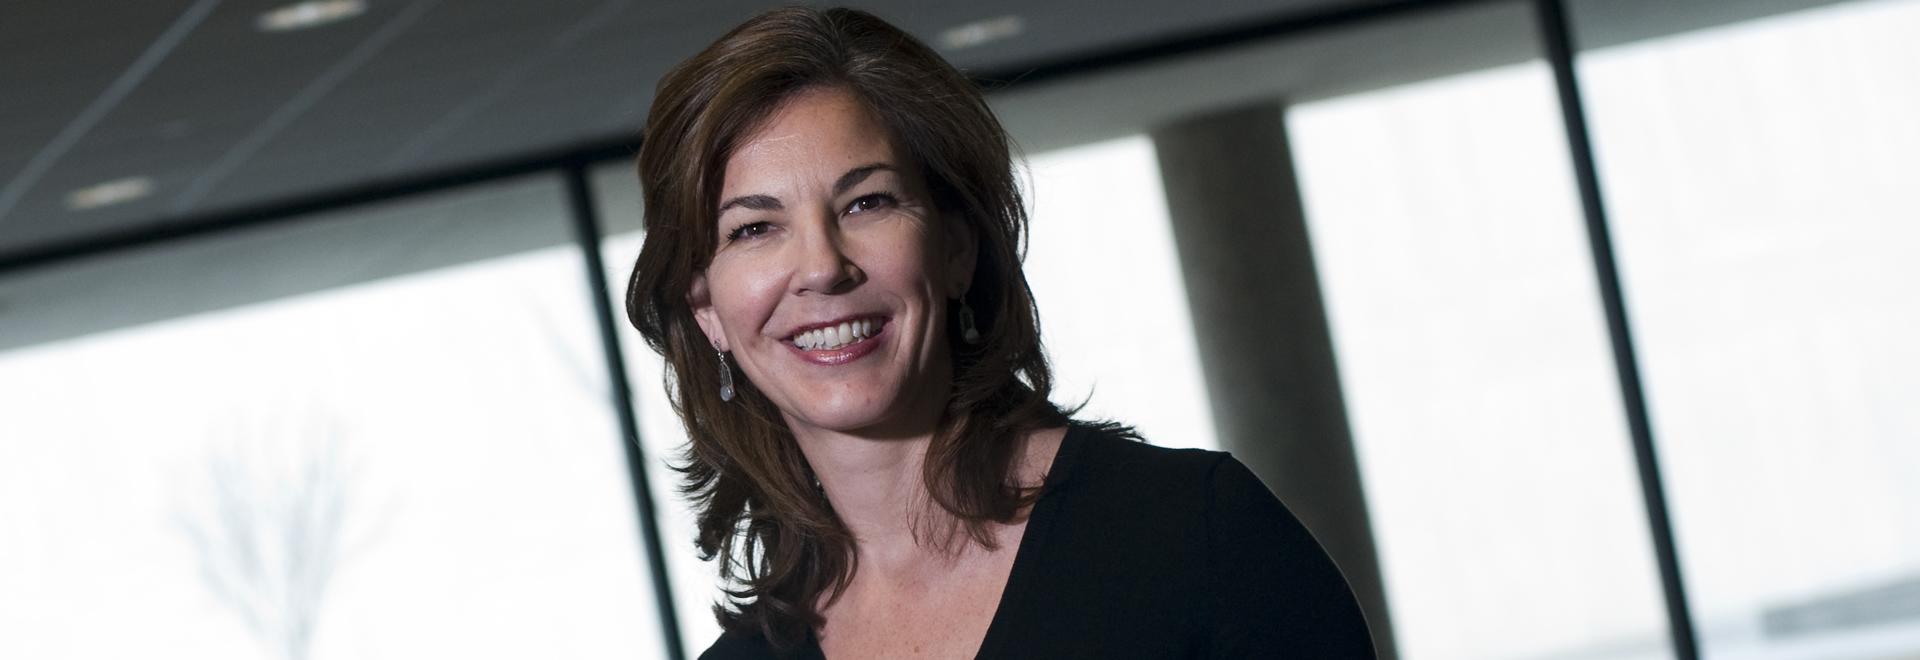 Cynthia Osborne, Ph. D.